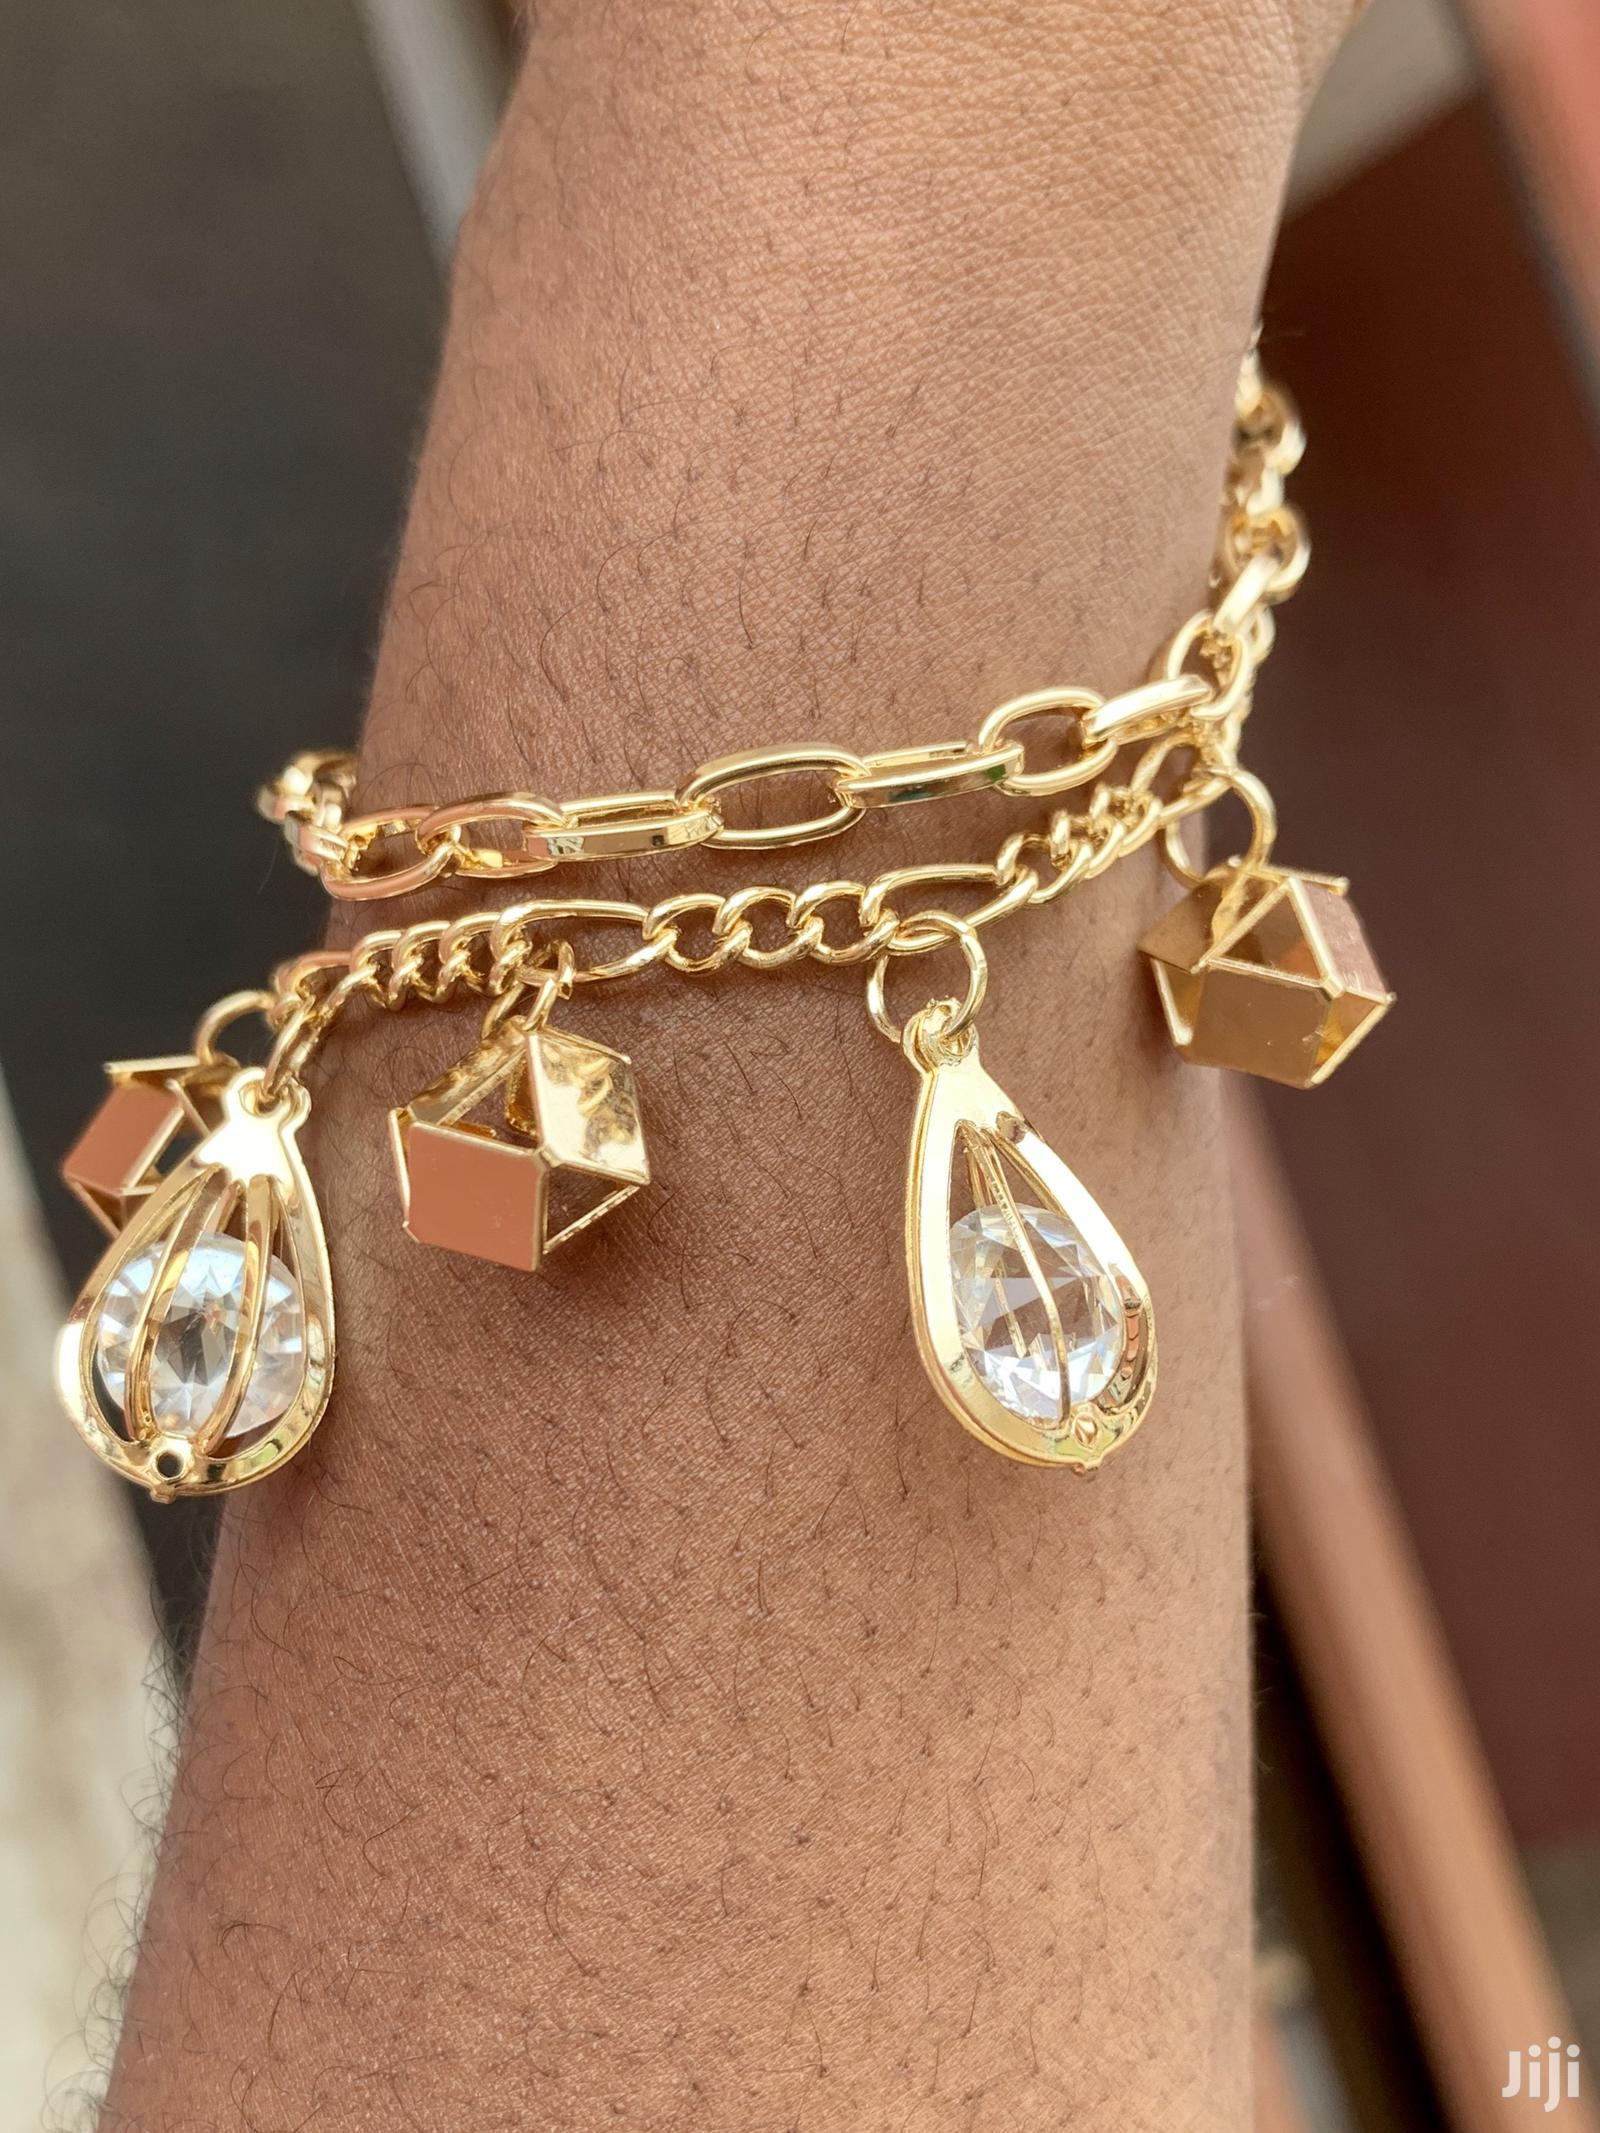 Bracelets That Speaks for Itself